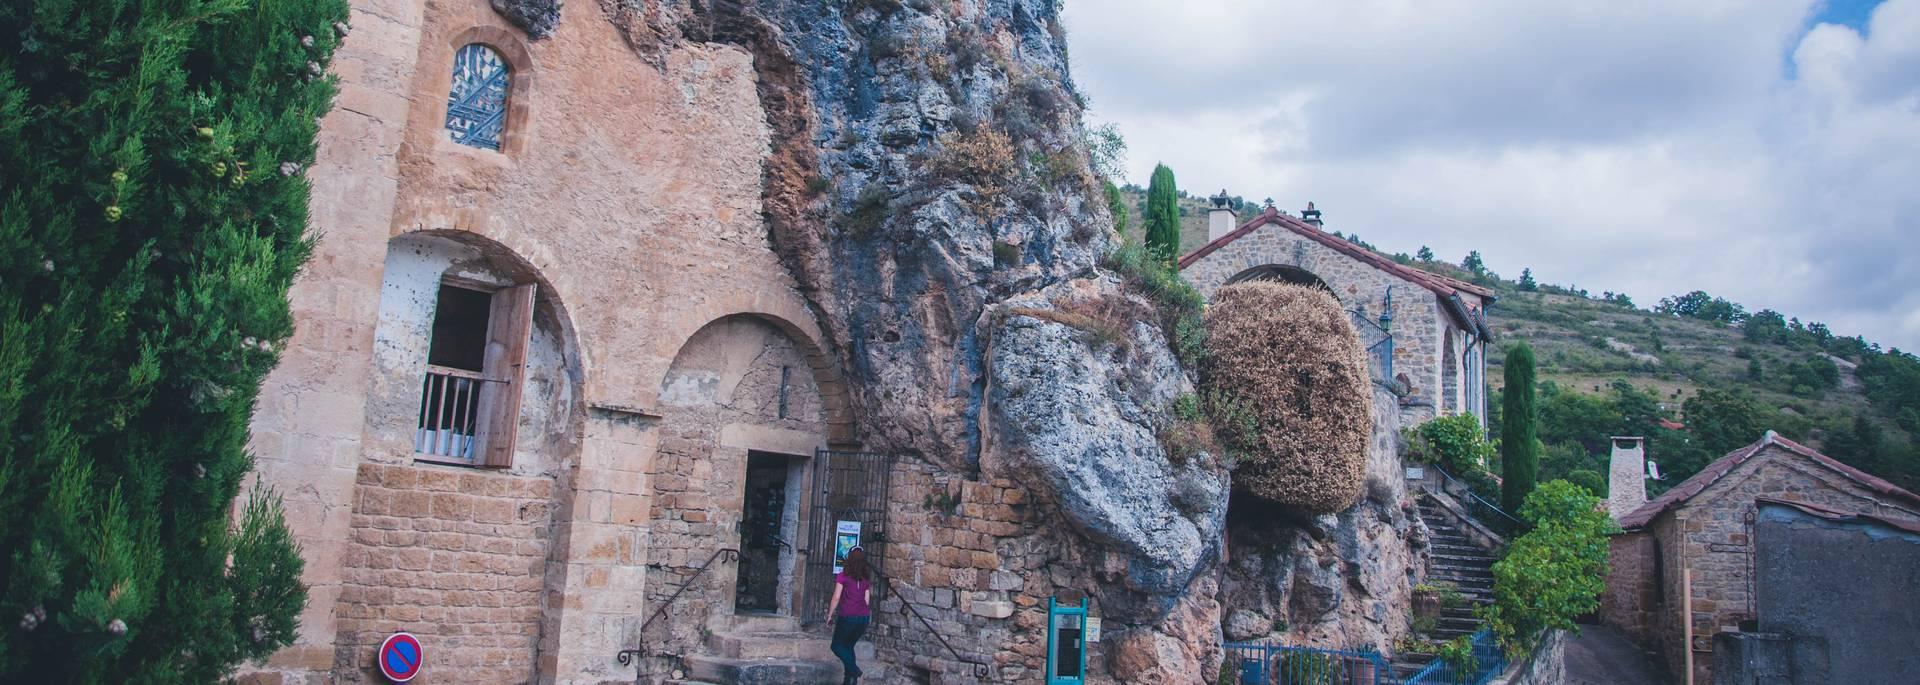 église semi-troglodytique de Peyre